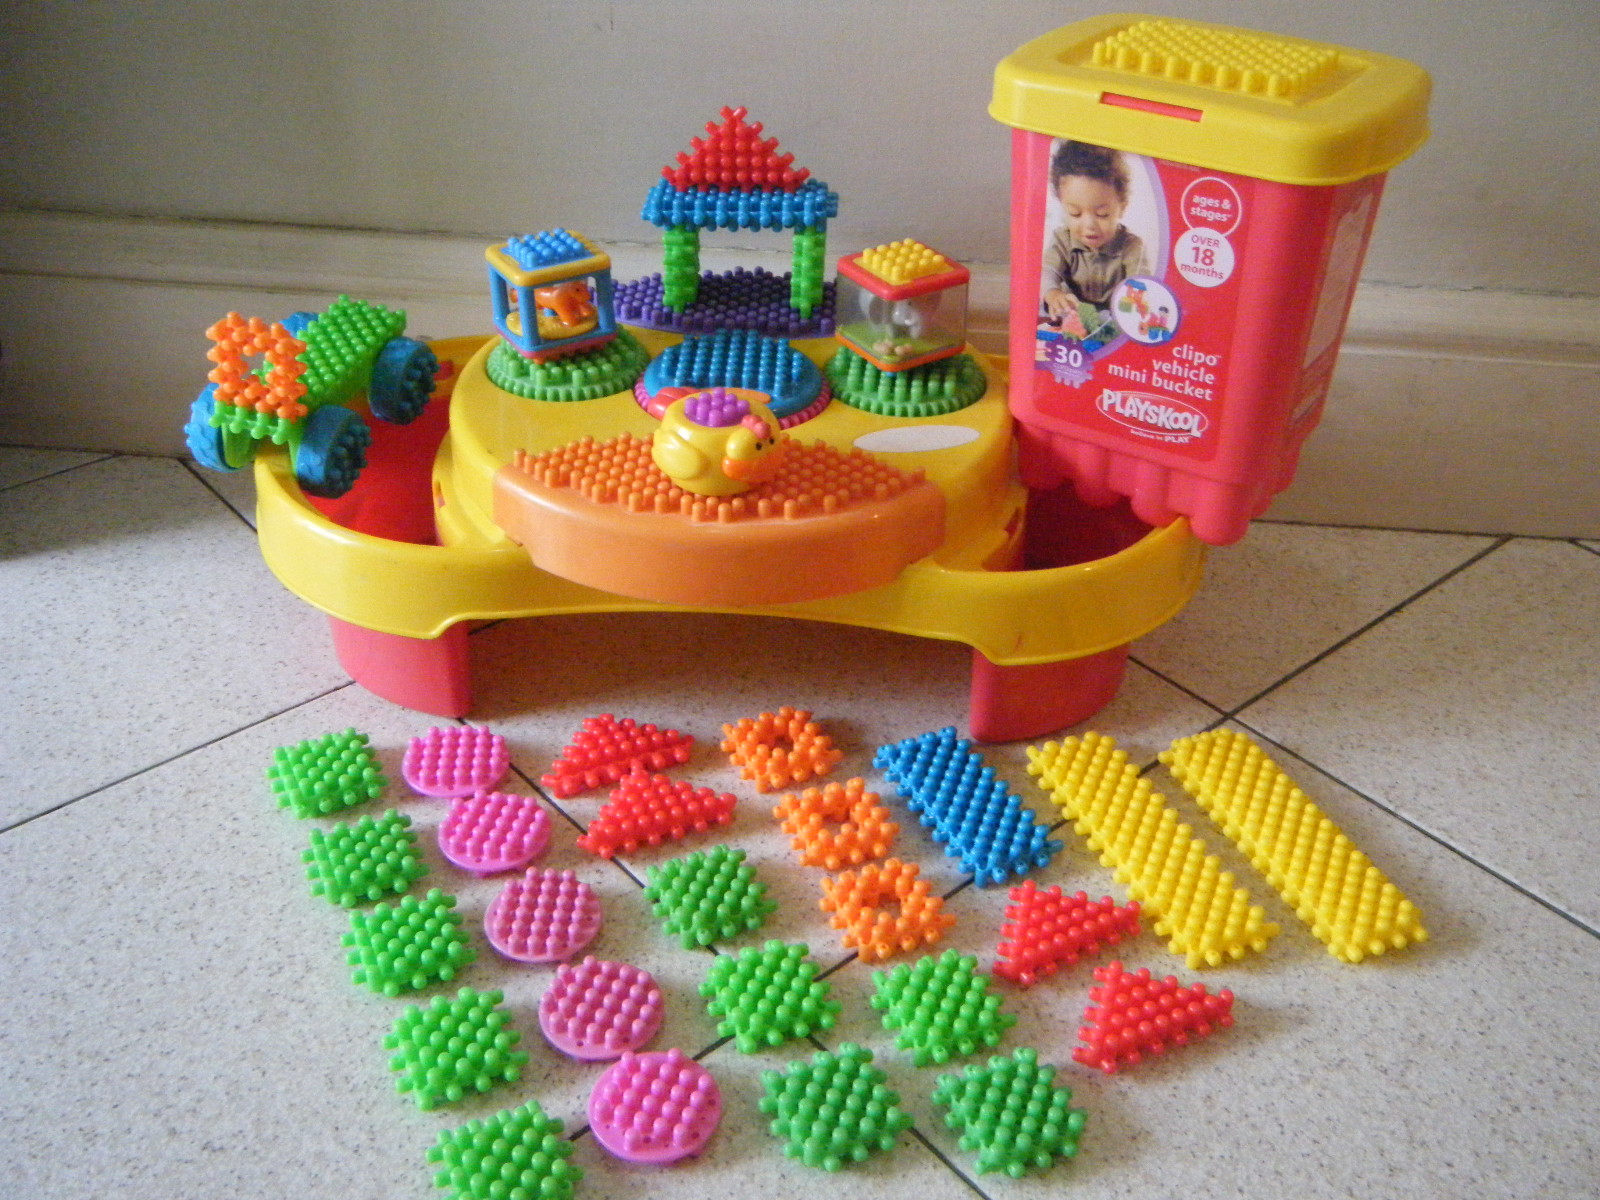 MommysLove4Baby143: Playskool Clipo Creativity Table 999p ...